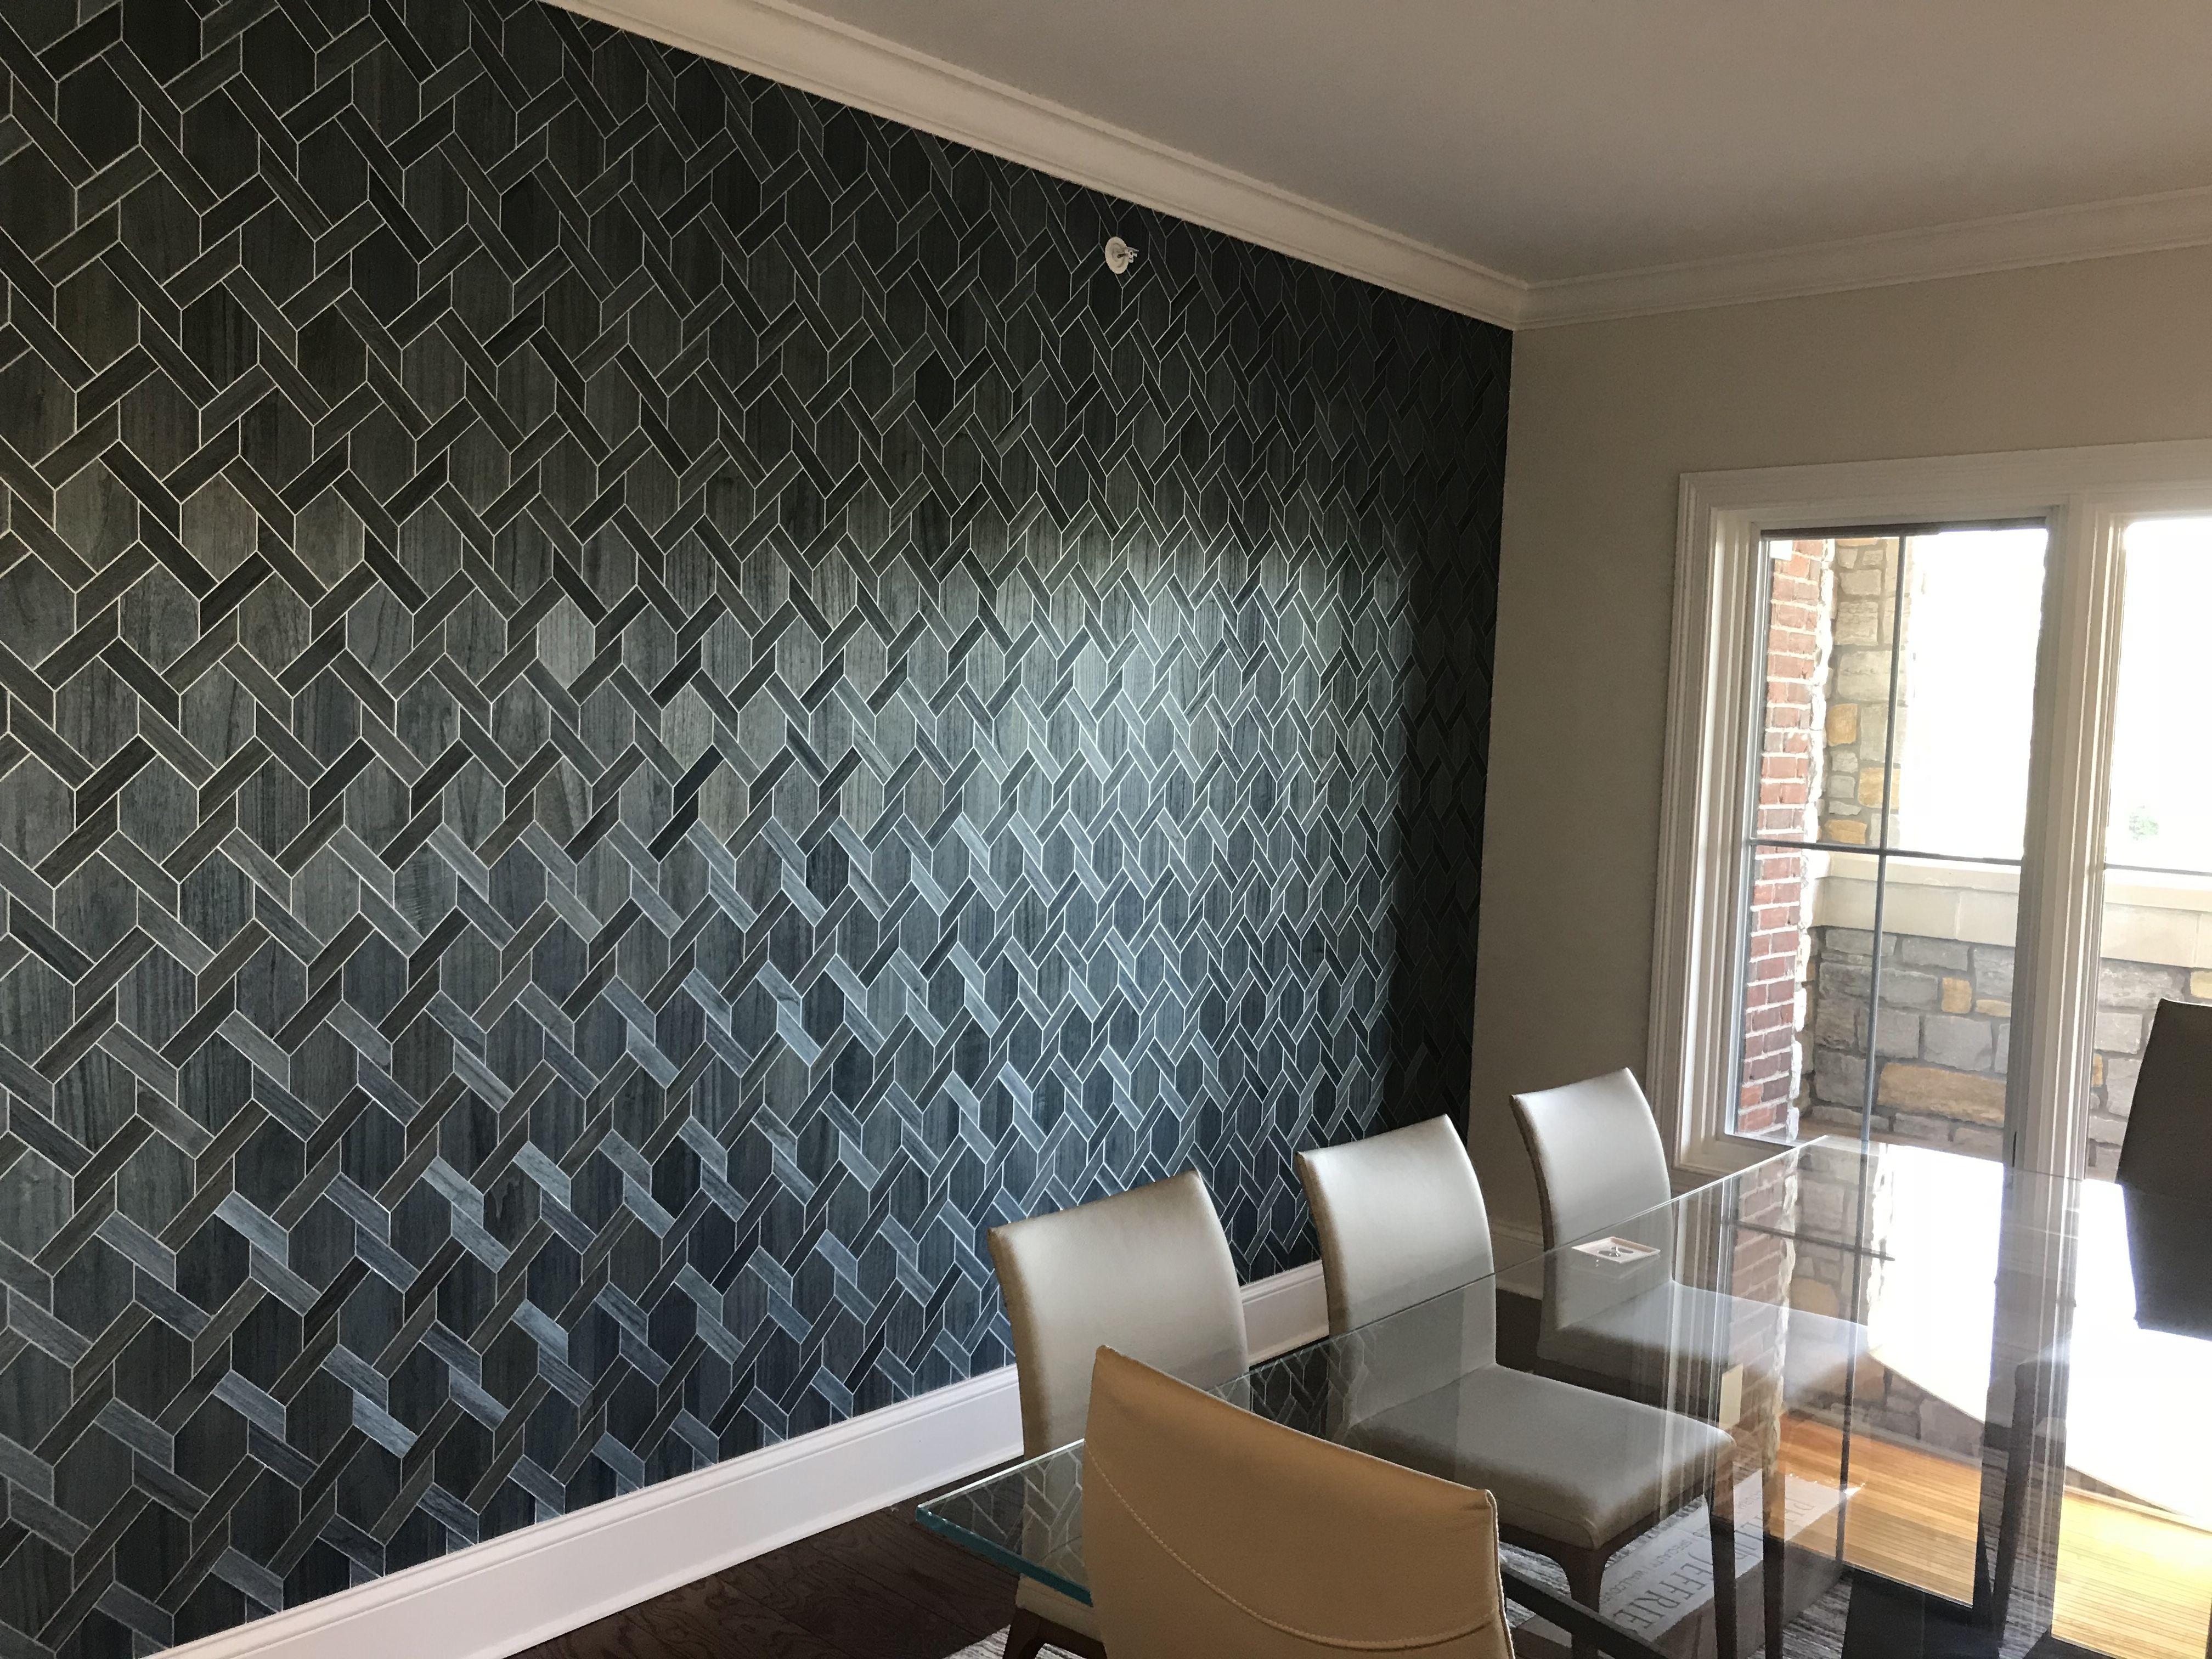 Decorative Wallpaper Installation Cincinnati Cress Wallpapering Paint How To Install Wallpaper Wallpaper Decor Local Design